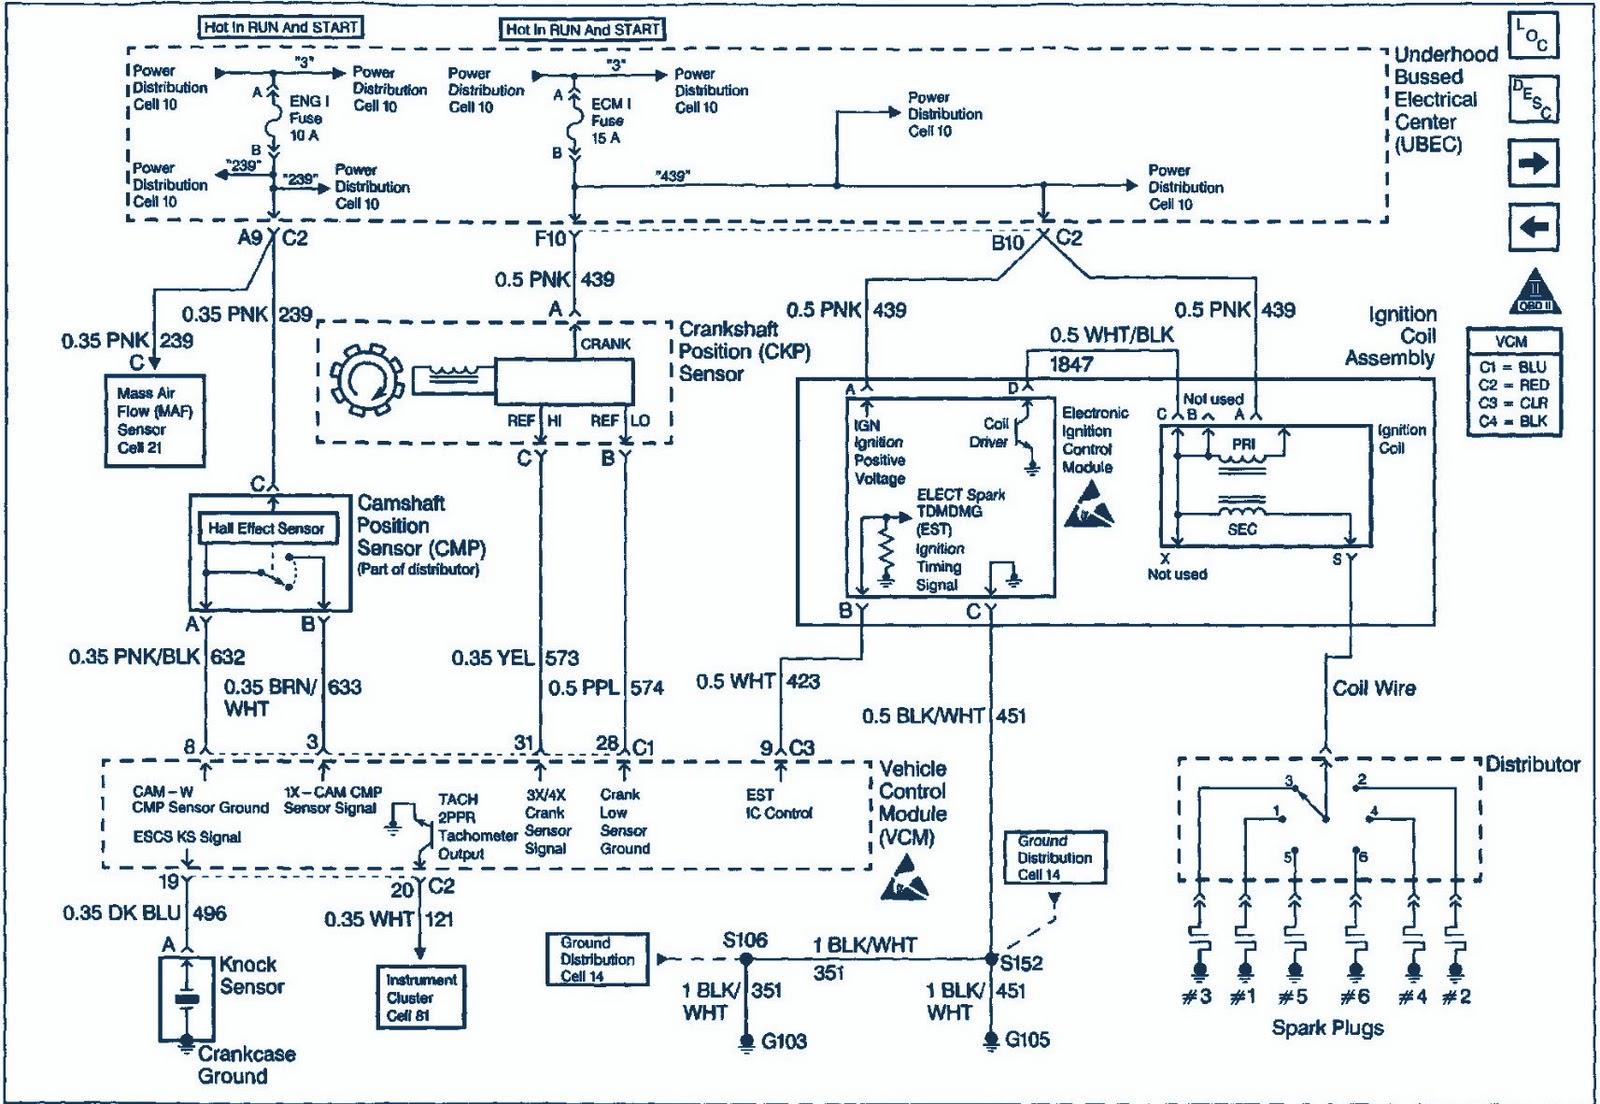 1998+Gmc+Jimmy+Wiring+Diagram?h\\\\\\\\\\\\\\=125 bmw factory radio wiring diagrams 1998 online car diagrams, bmw E39 Engine Diagram at sewacar.co